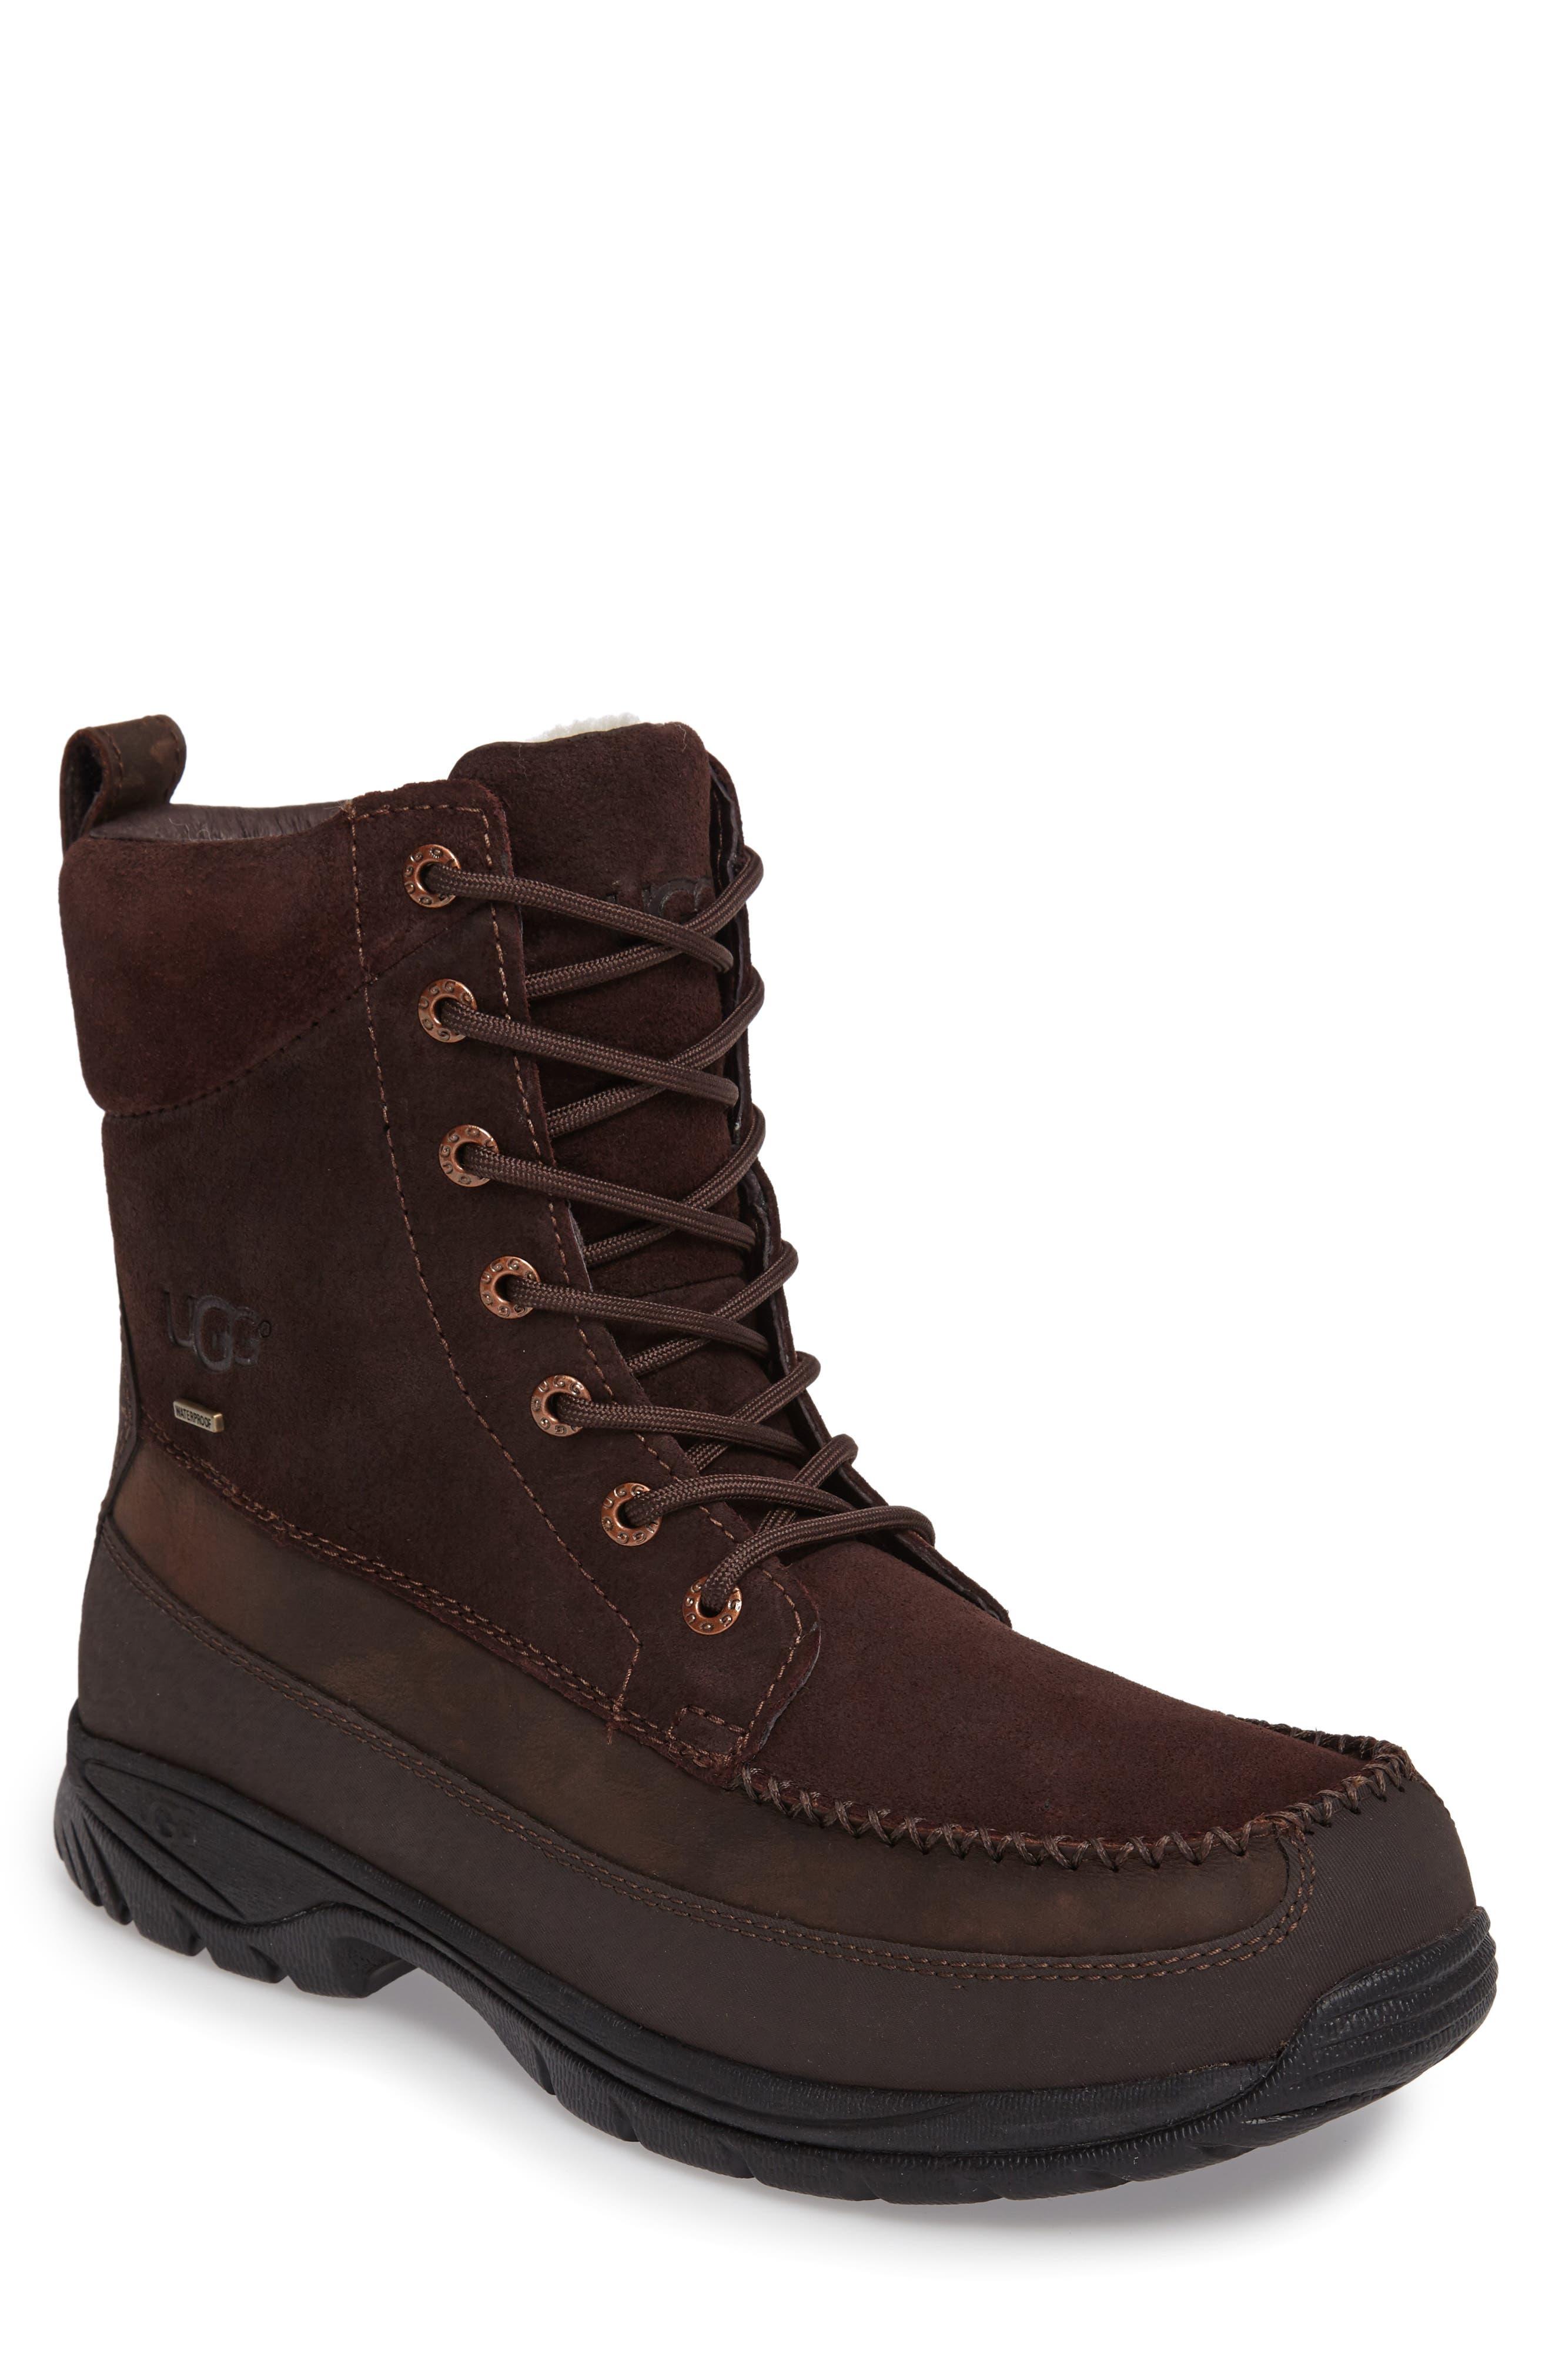 UGG<SUP>®</SUP> Archibald Snow Boot, Main, color, 207